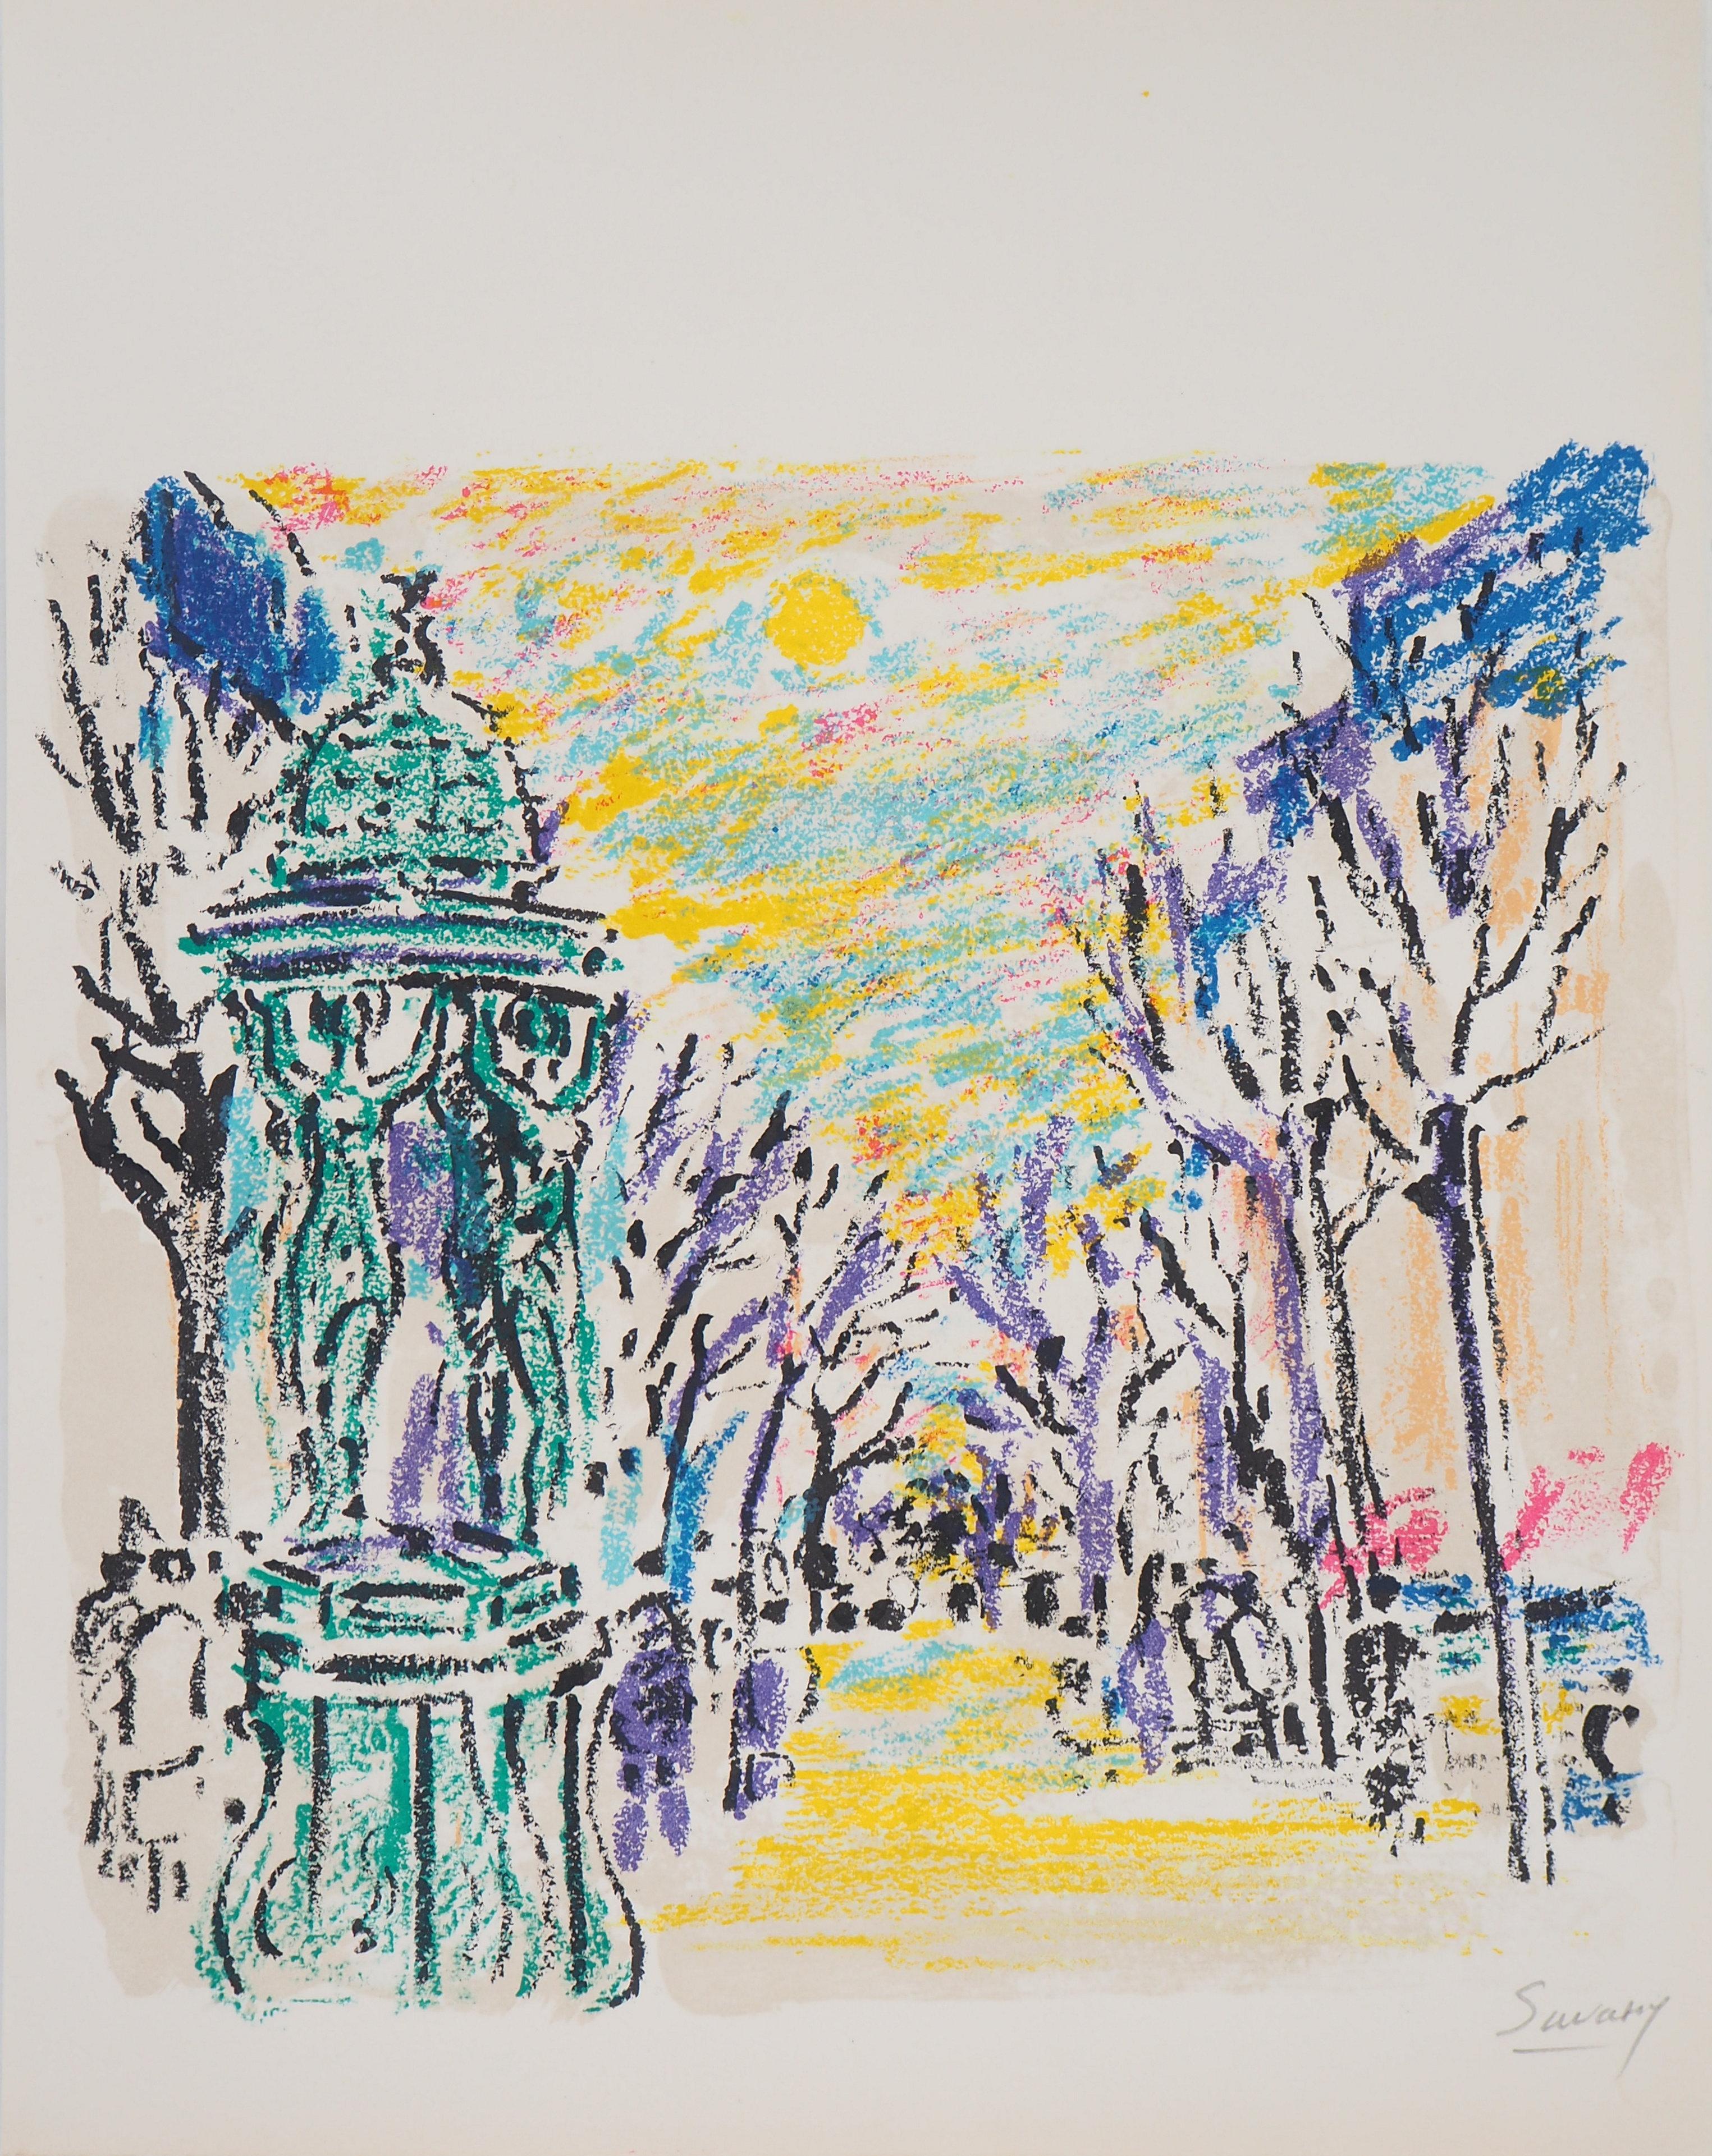 Paris : Wallace Fountain - Original Lithograph, Handsigned